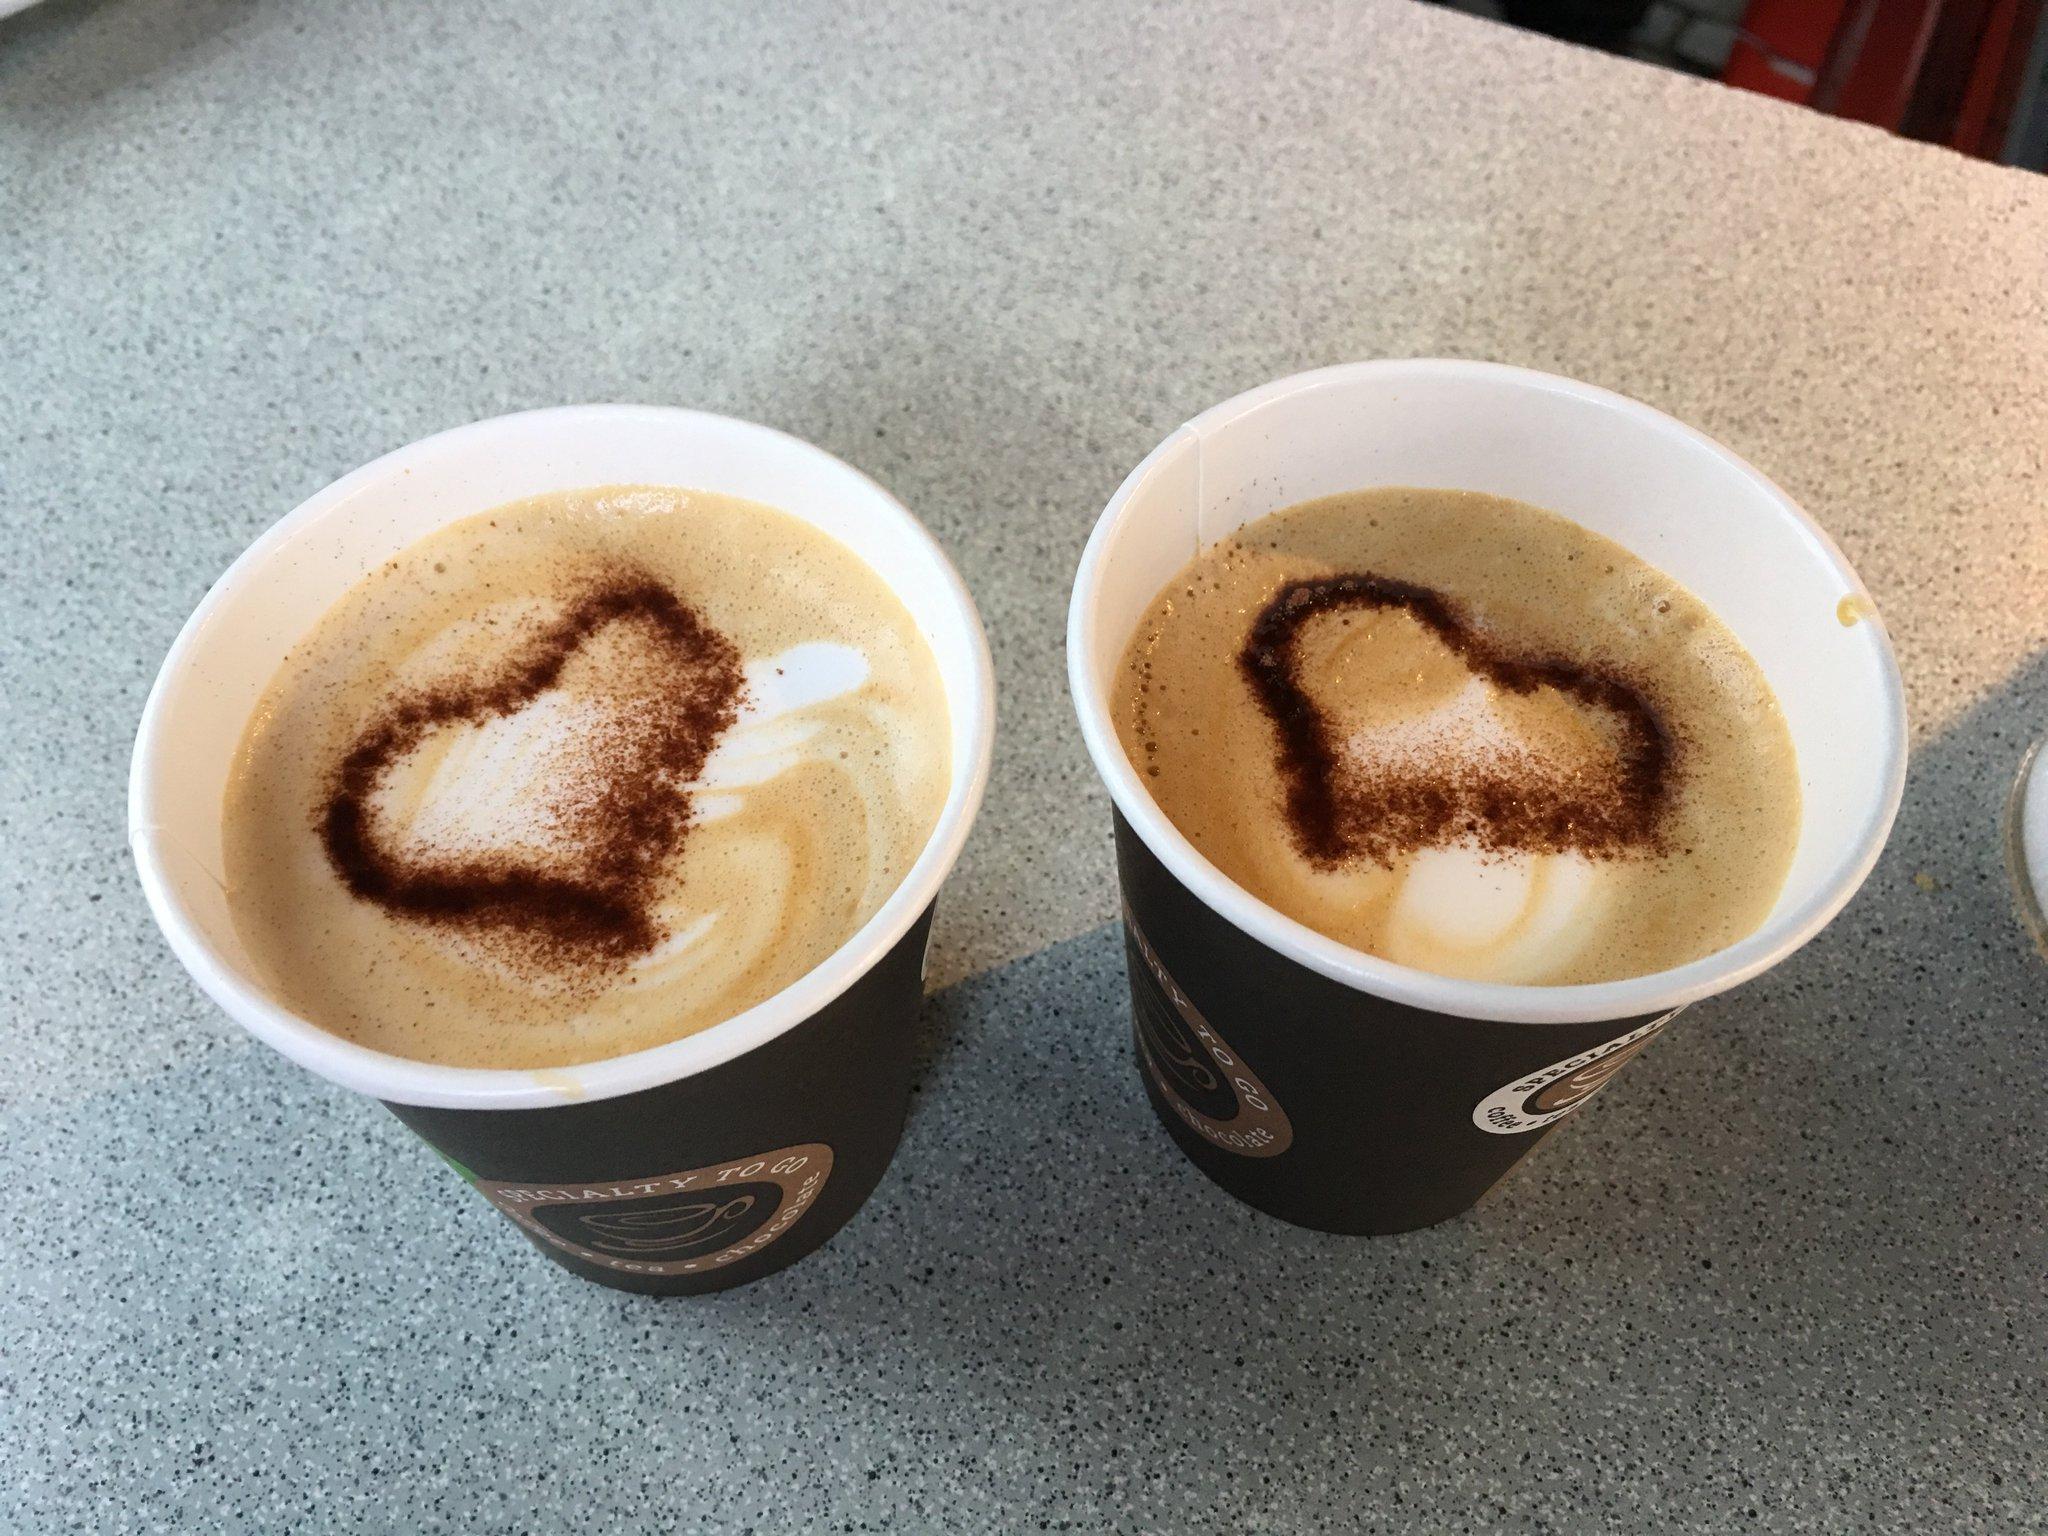 auch heute wieder lecker Kaffee #bcbn17 https://t.co/tD1TcWju2W